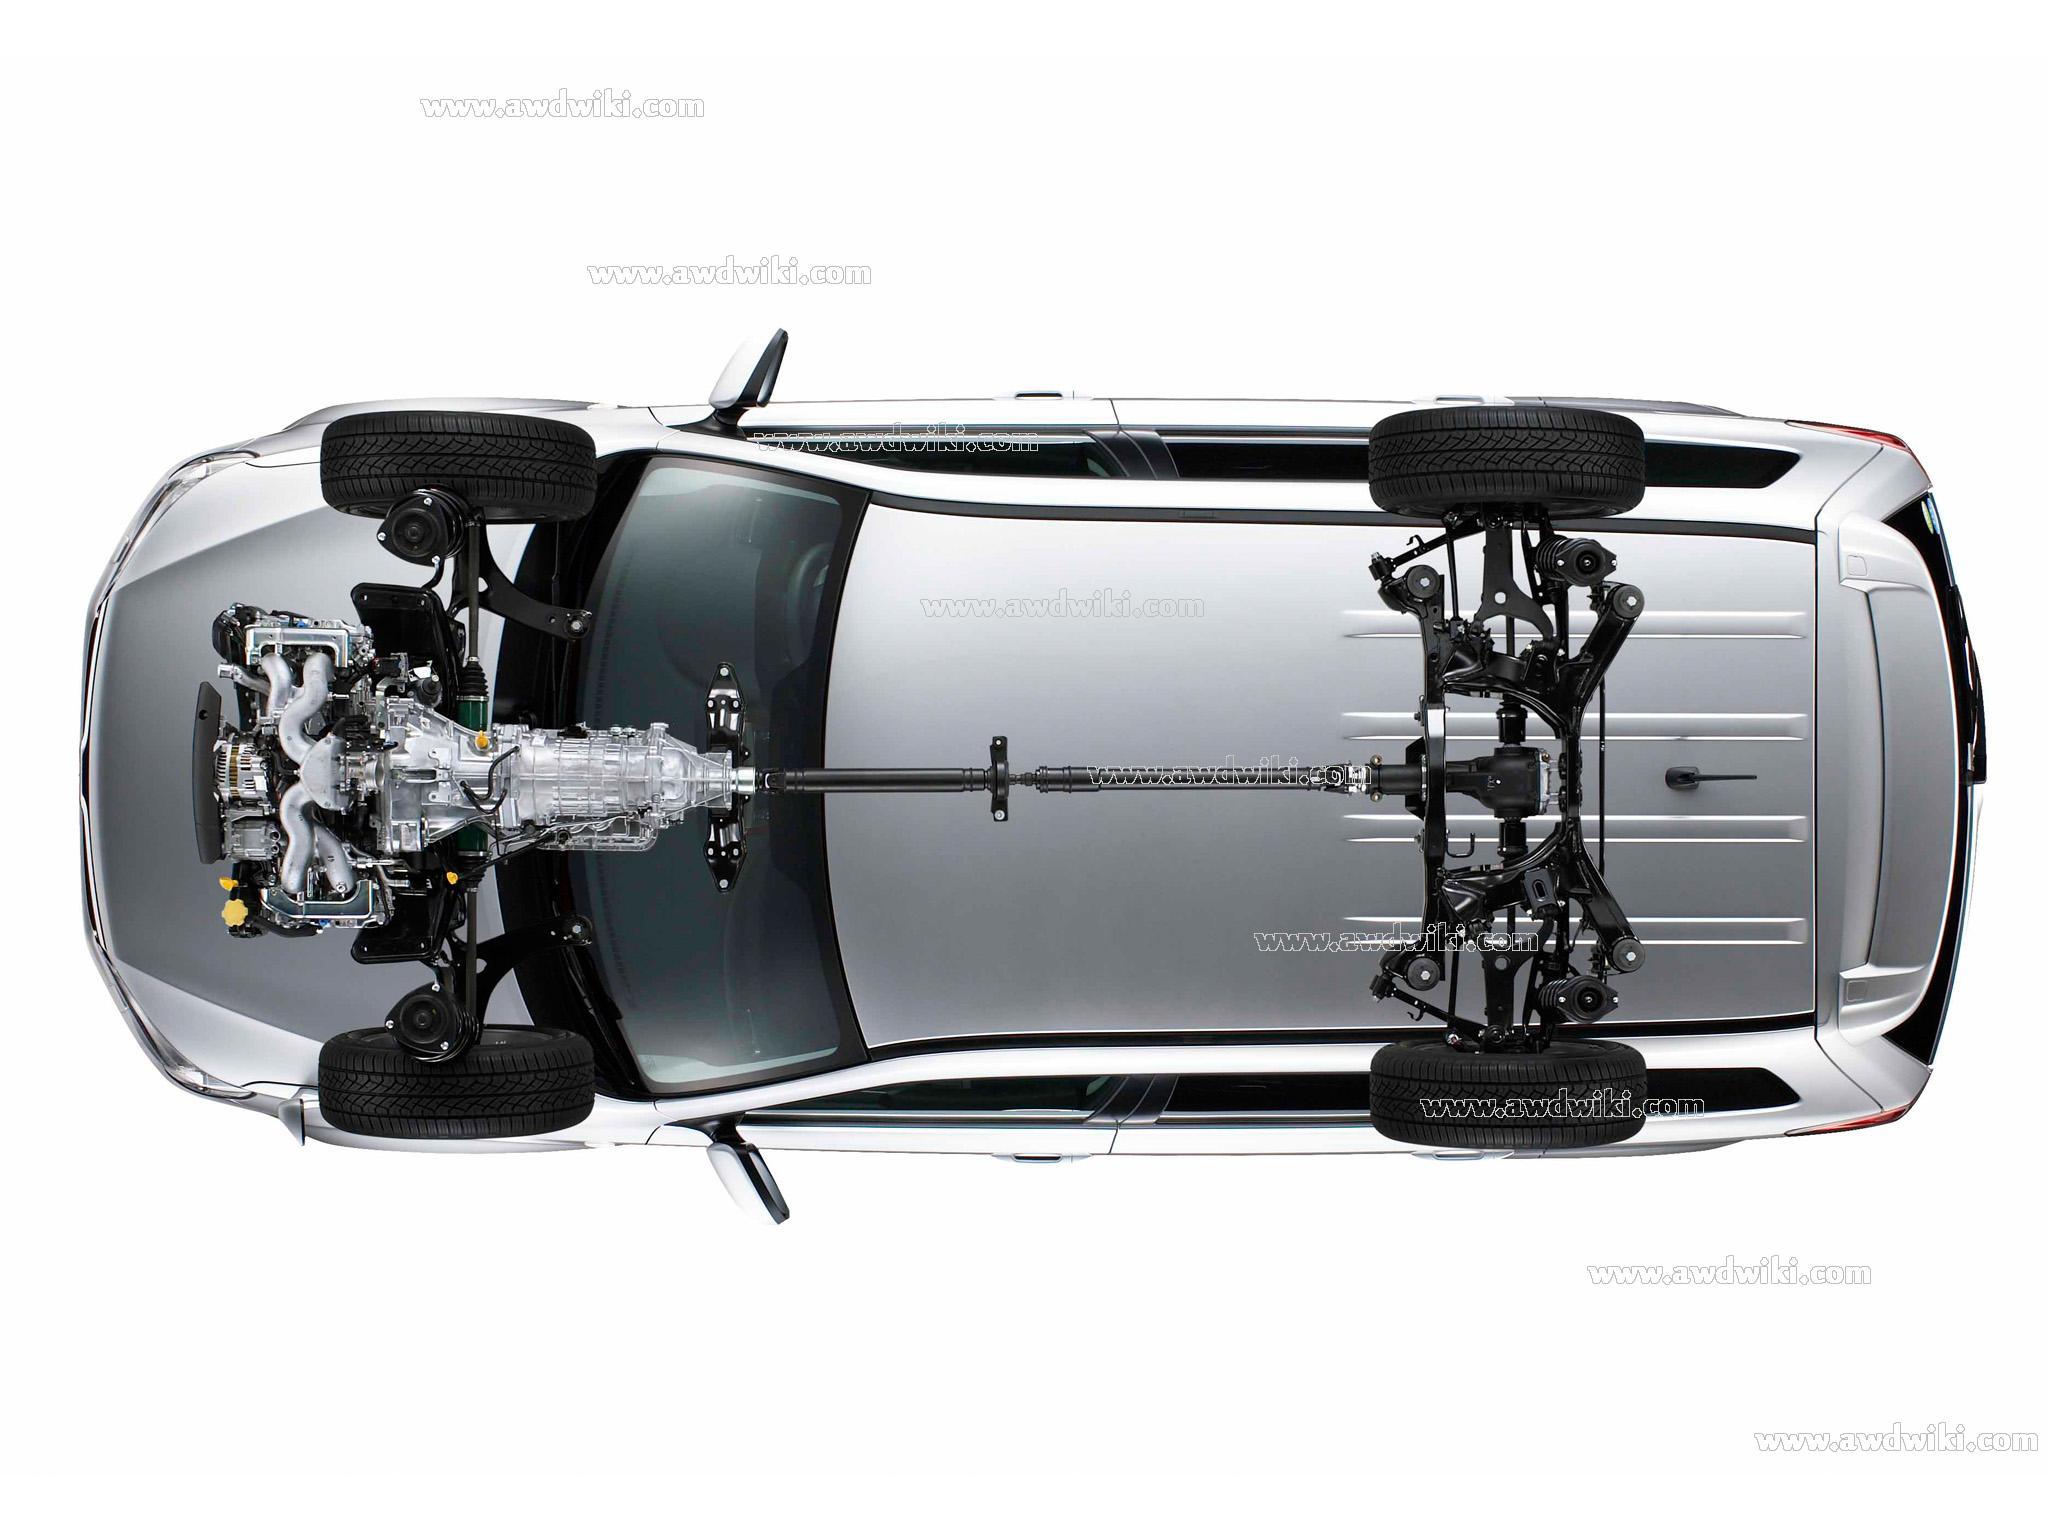 Subaru forester transsmision third generation